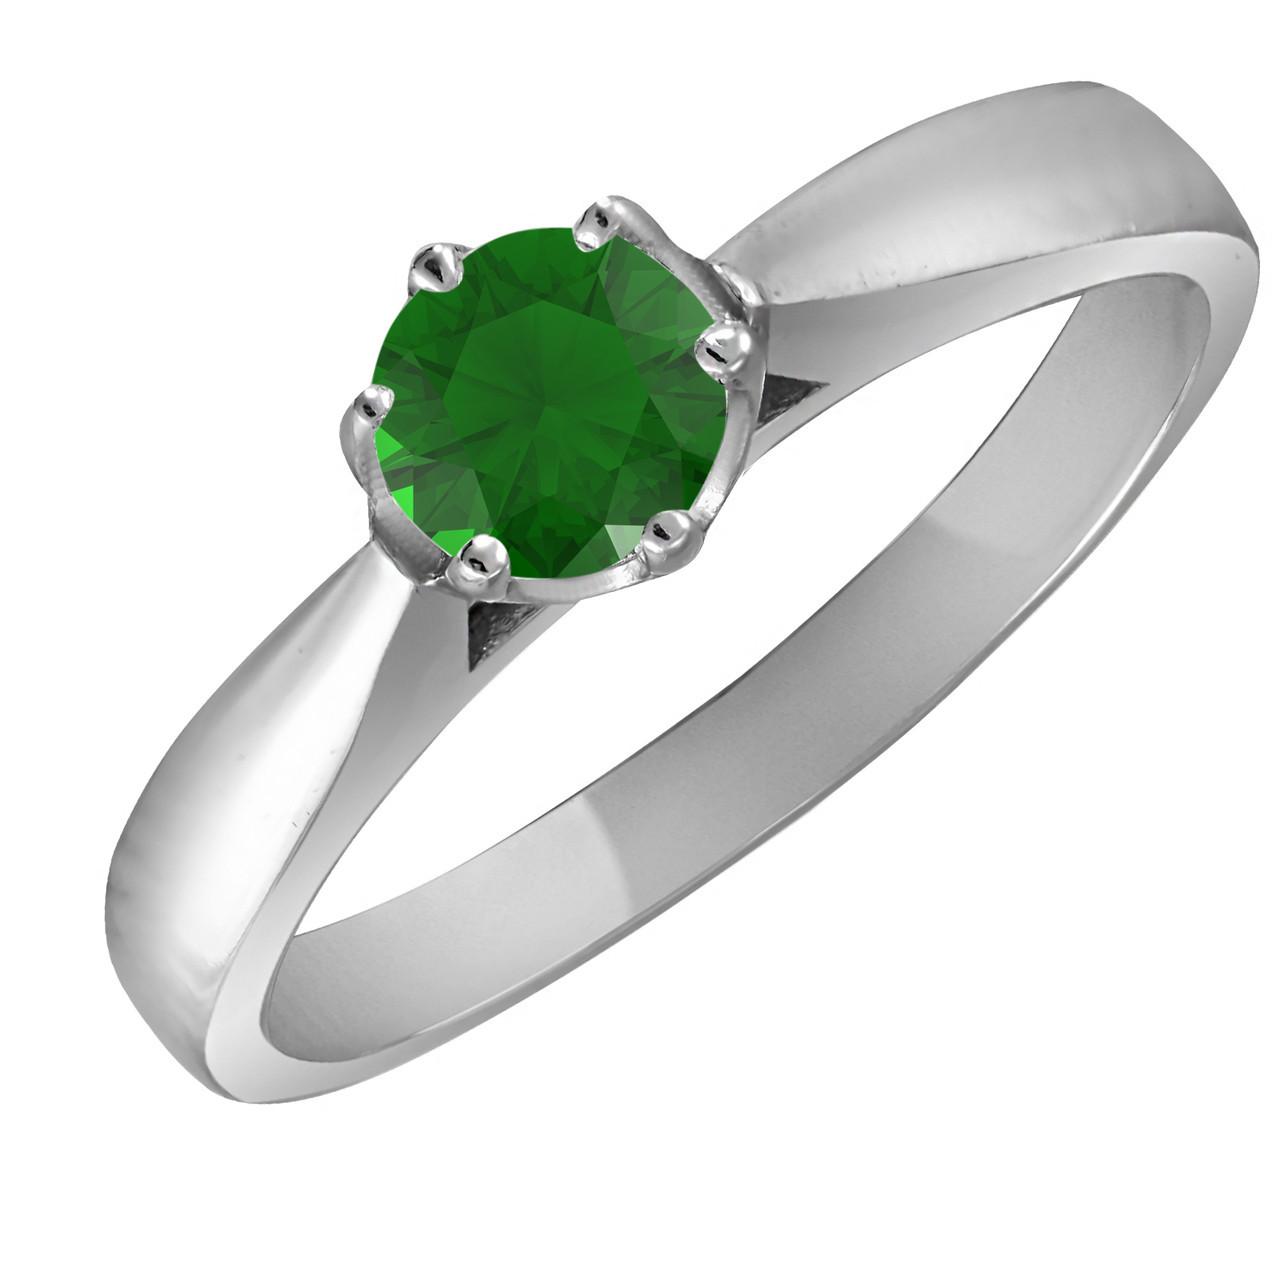 Кольцо из серебра с зелёным кубическим цирконием Twiddle Jewelry 19.5 размер (К015з-19.5)